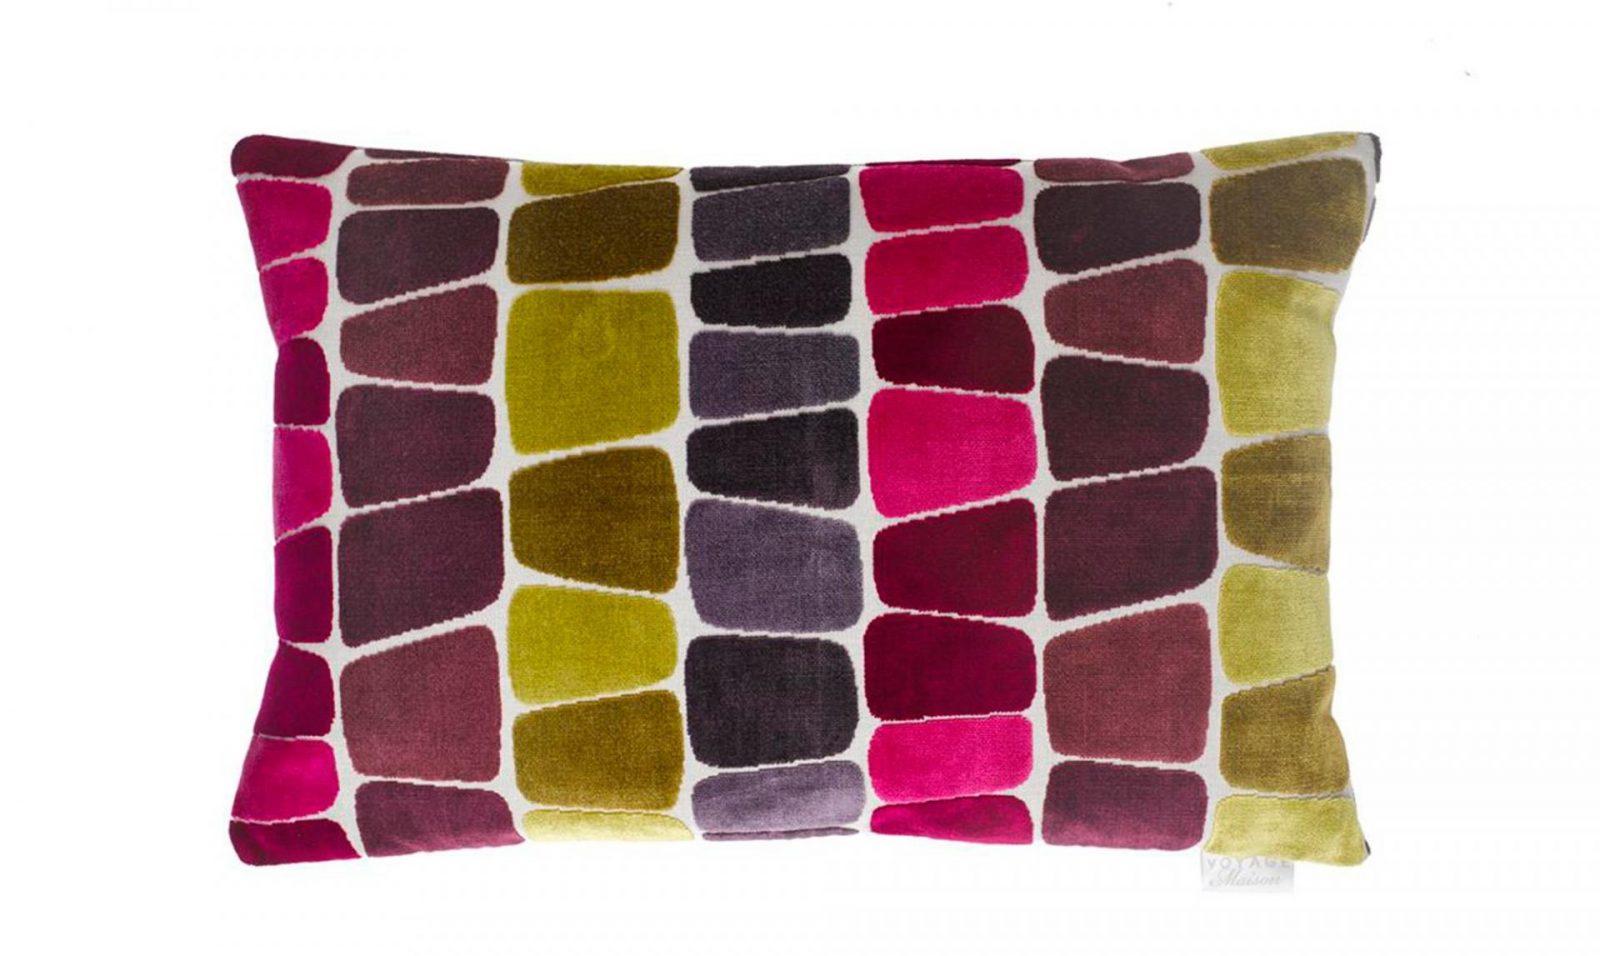 Taman Lotus Bloster Cushions from Fishpools